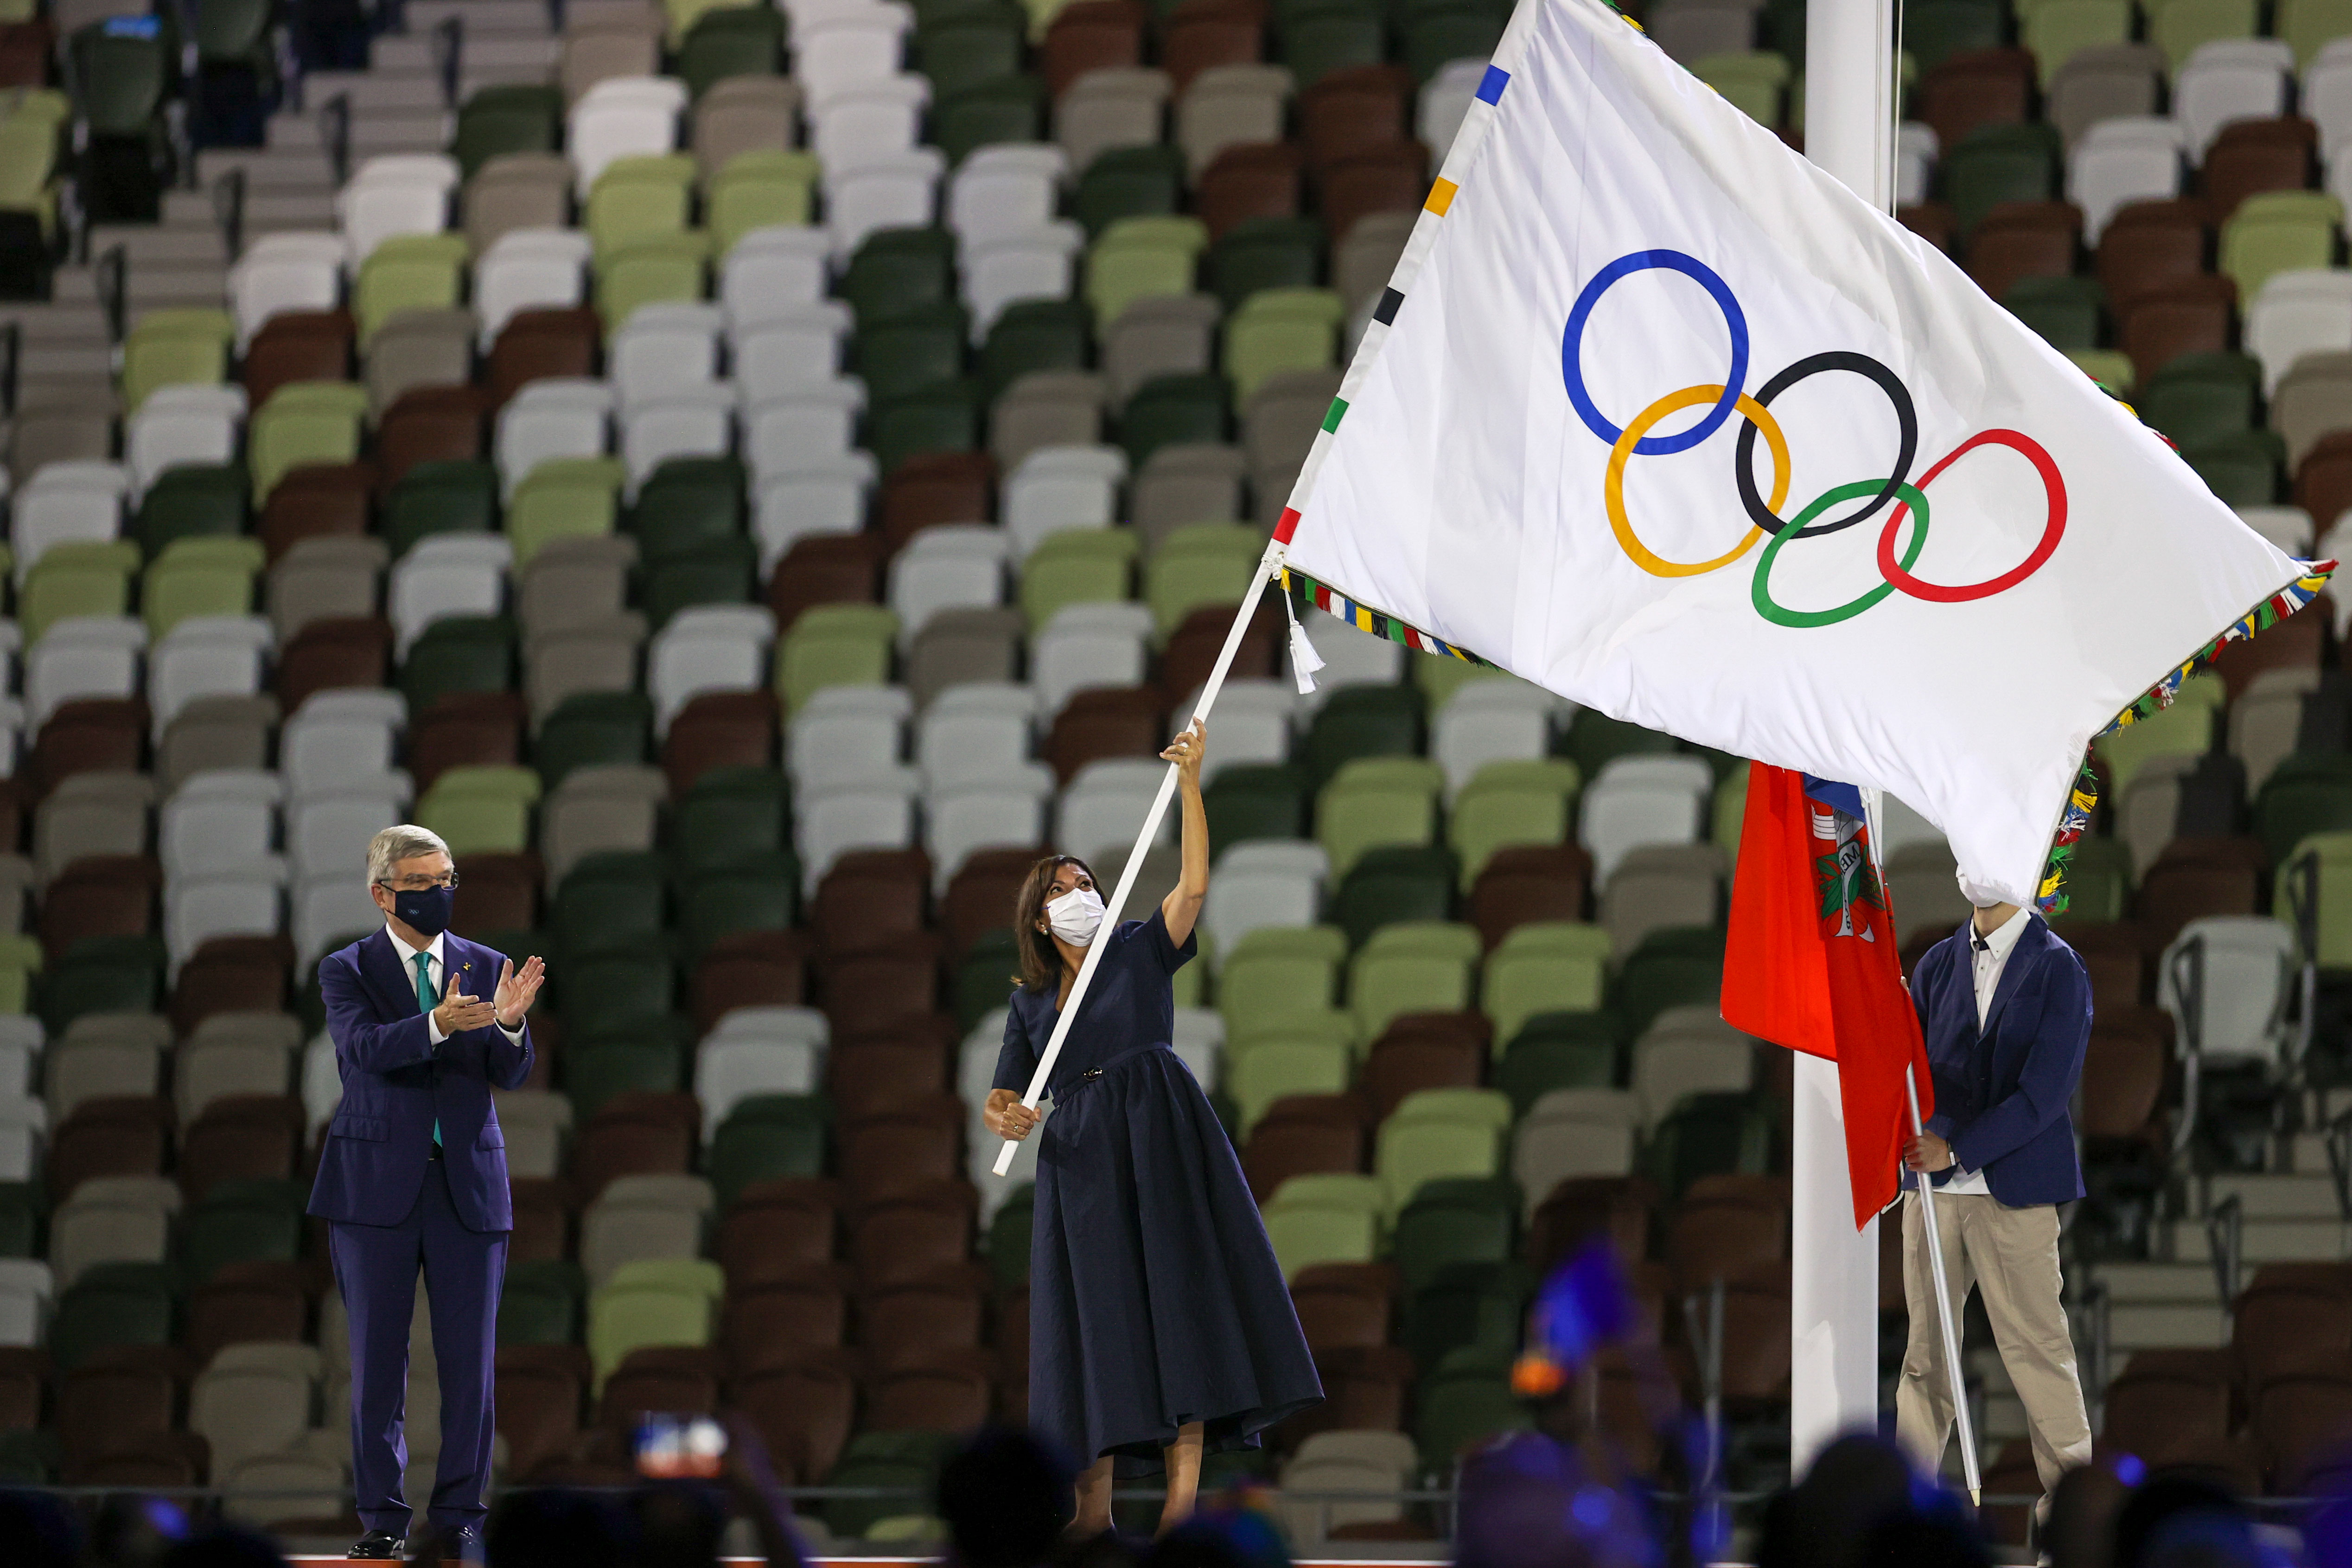 Paris Mayor Anne Hidalgo waves the Olympic flag.